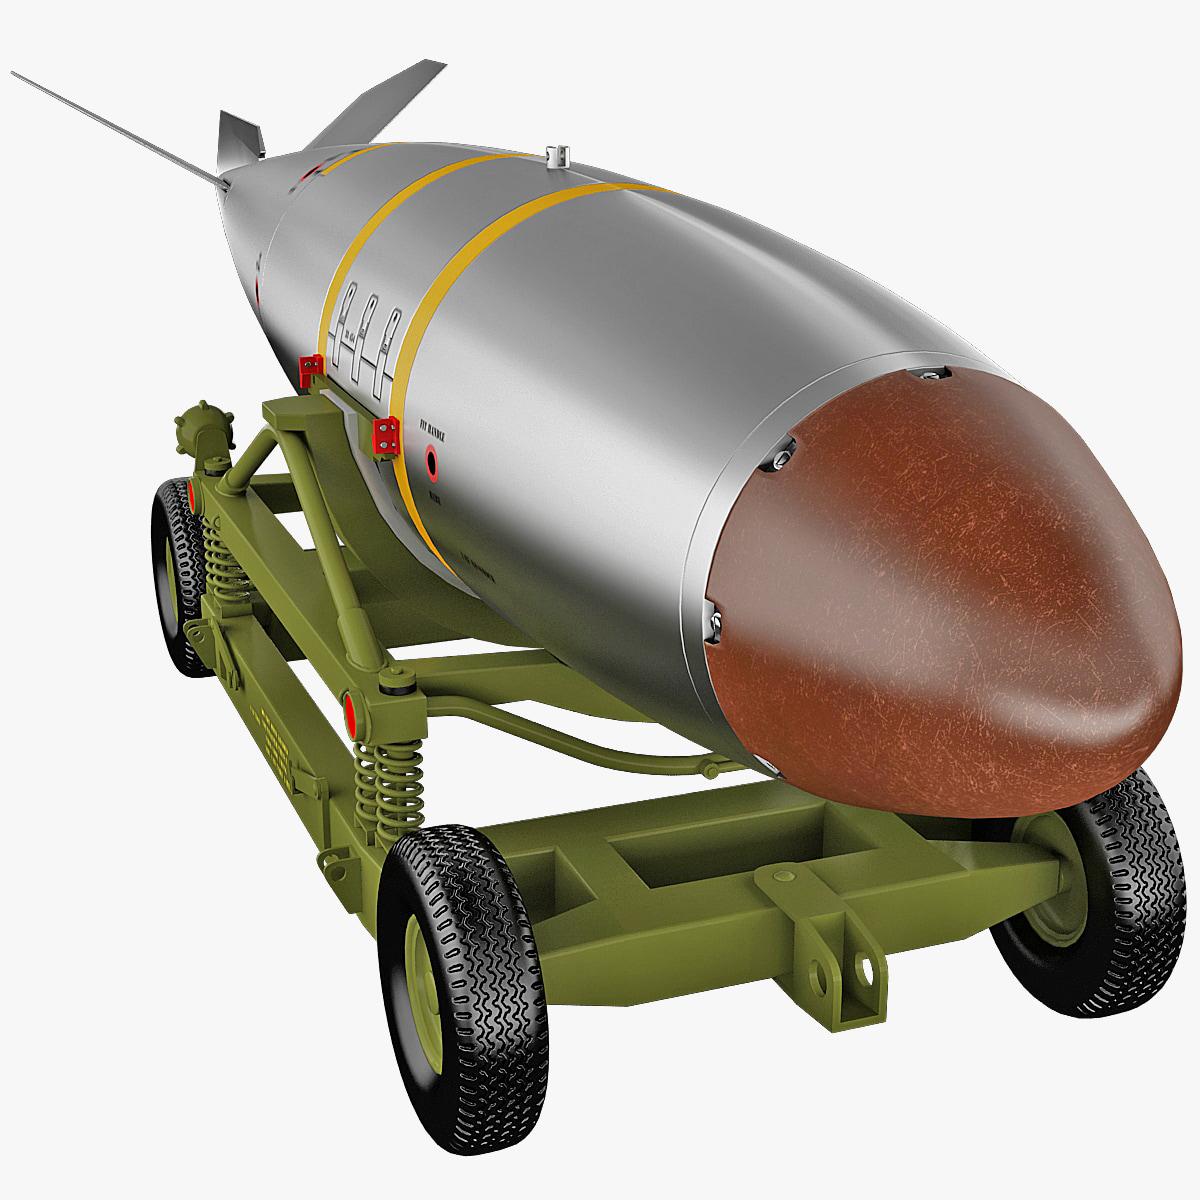 Nuclear_Bomb_Mark_7_Collection_000.jpg